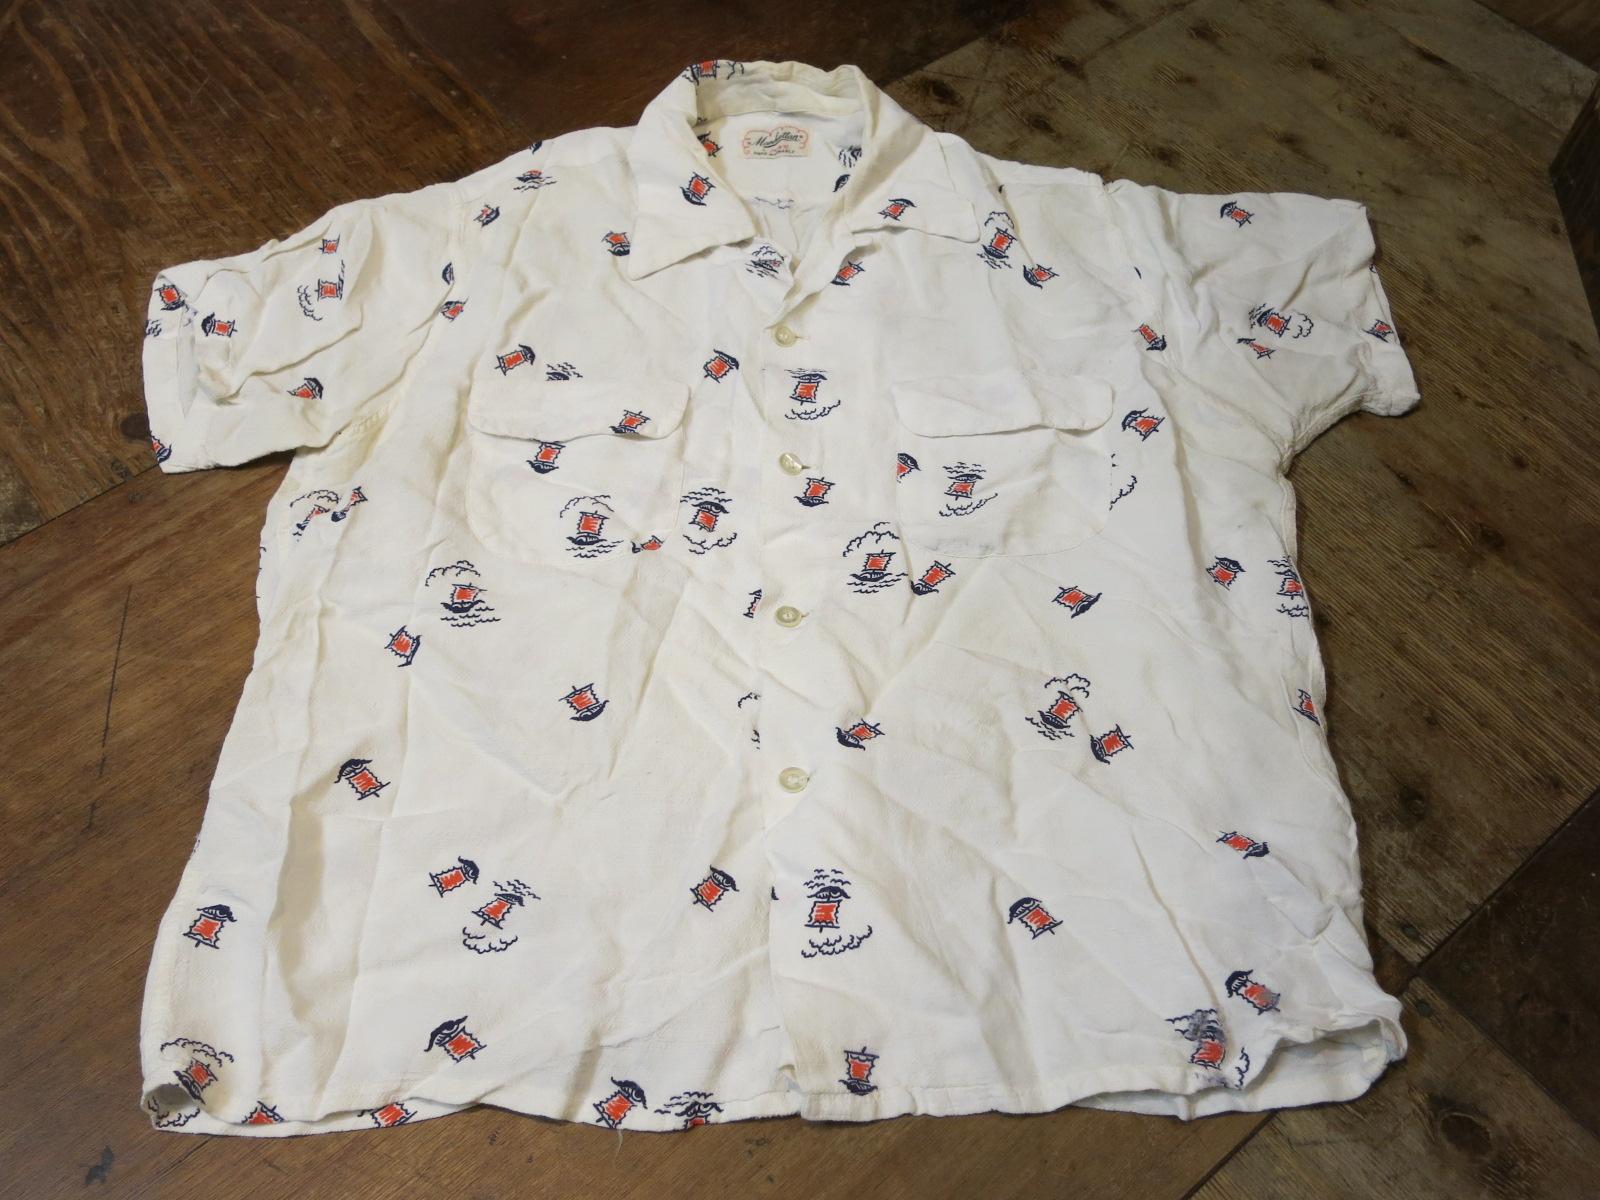 6/27(土)入荷!50\'S Manhattan shirts!!_c0144020_15452124.jpg